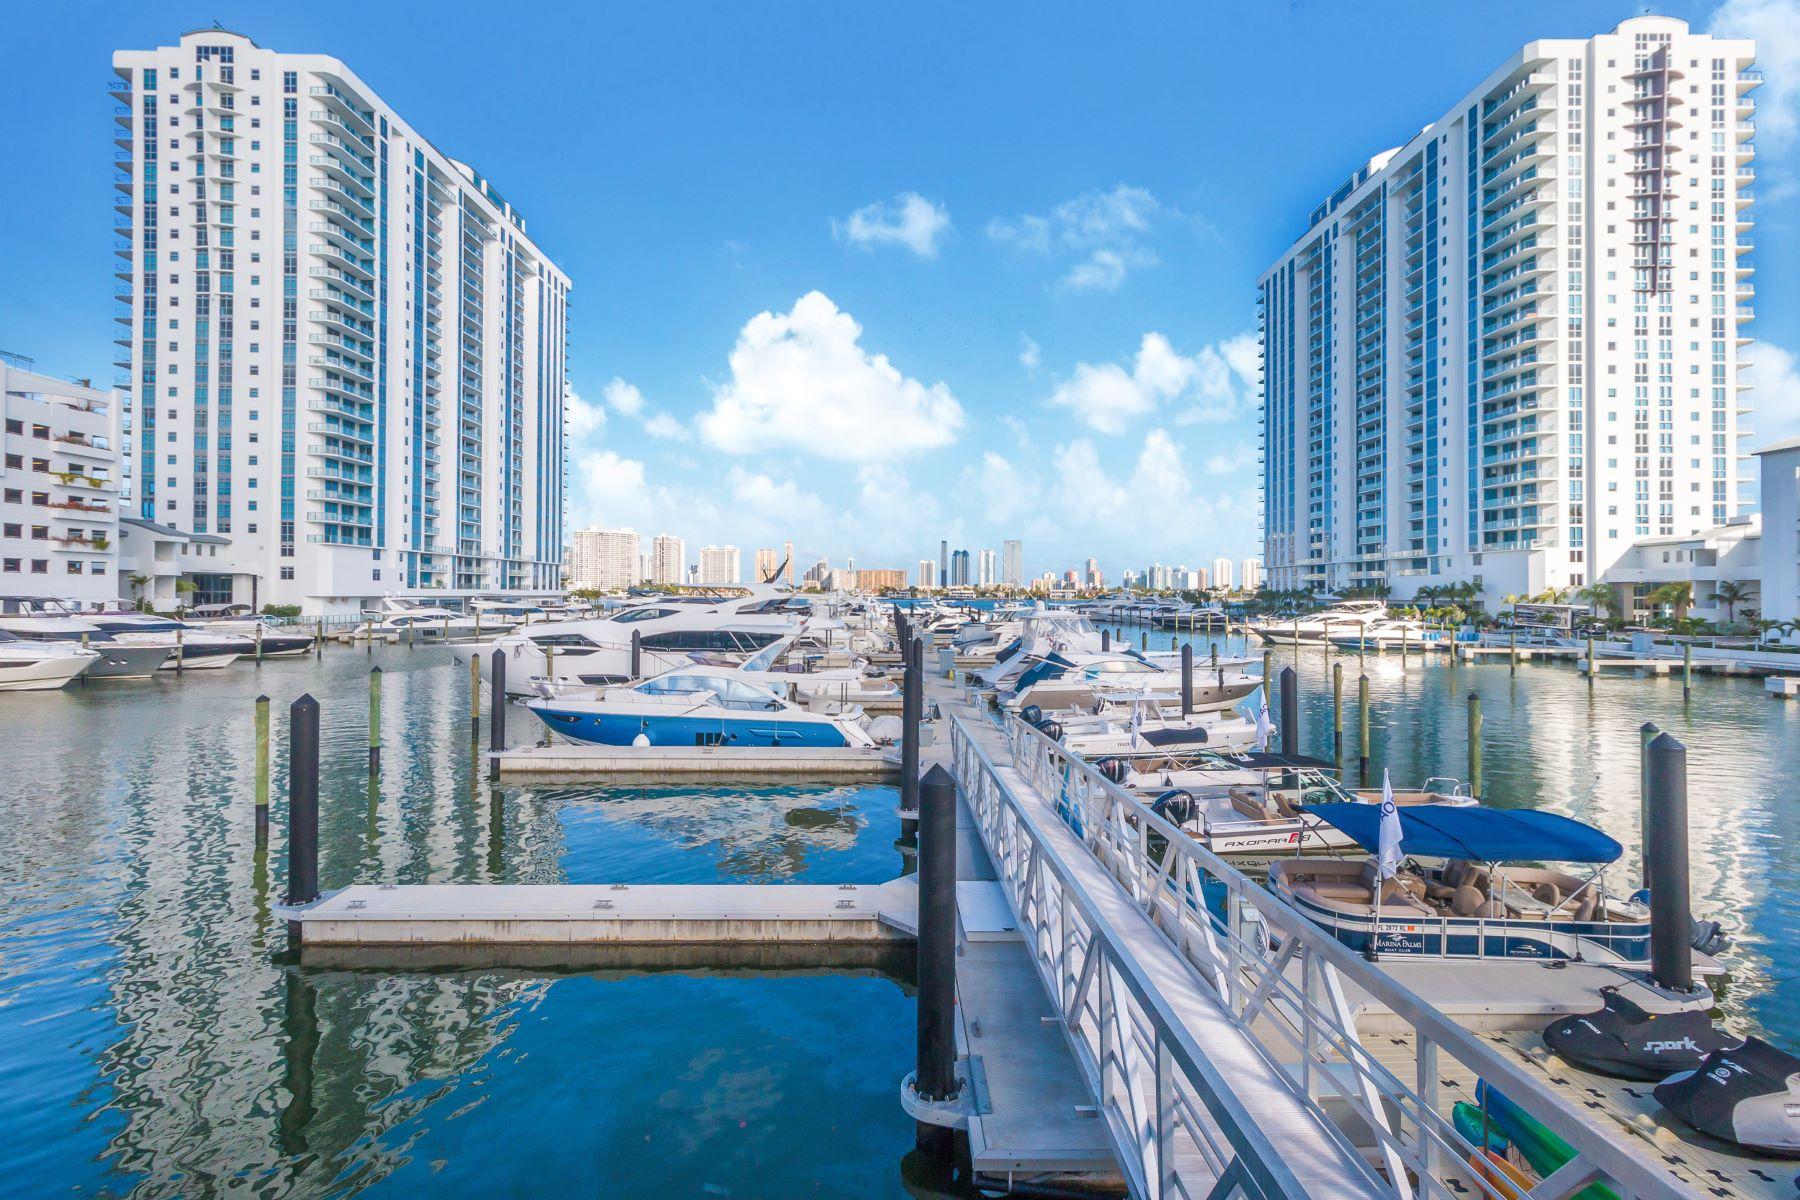 Condomínio para Venda às 17111 Biscayne Blvd #1909 17111 Biscayne Blvd 1909 North Miami Beach, Florida 33160 Estados Unidos